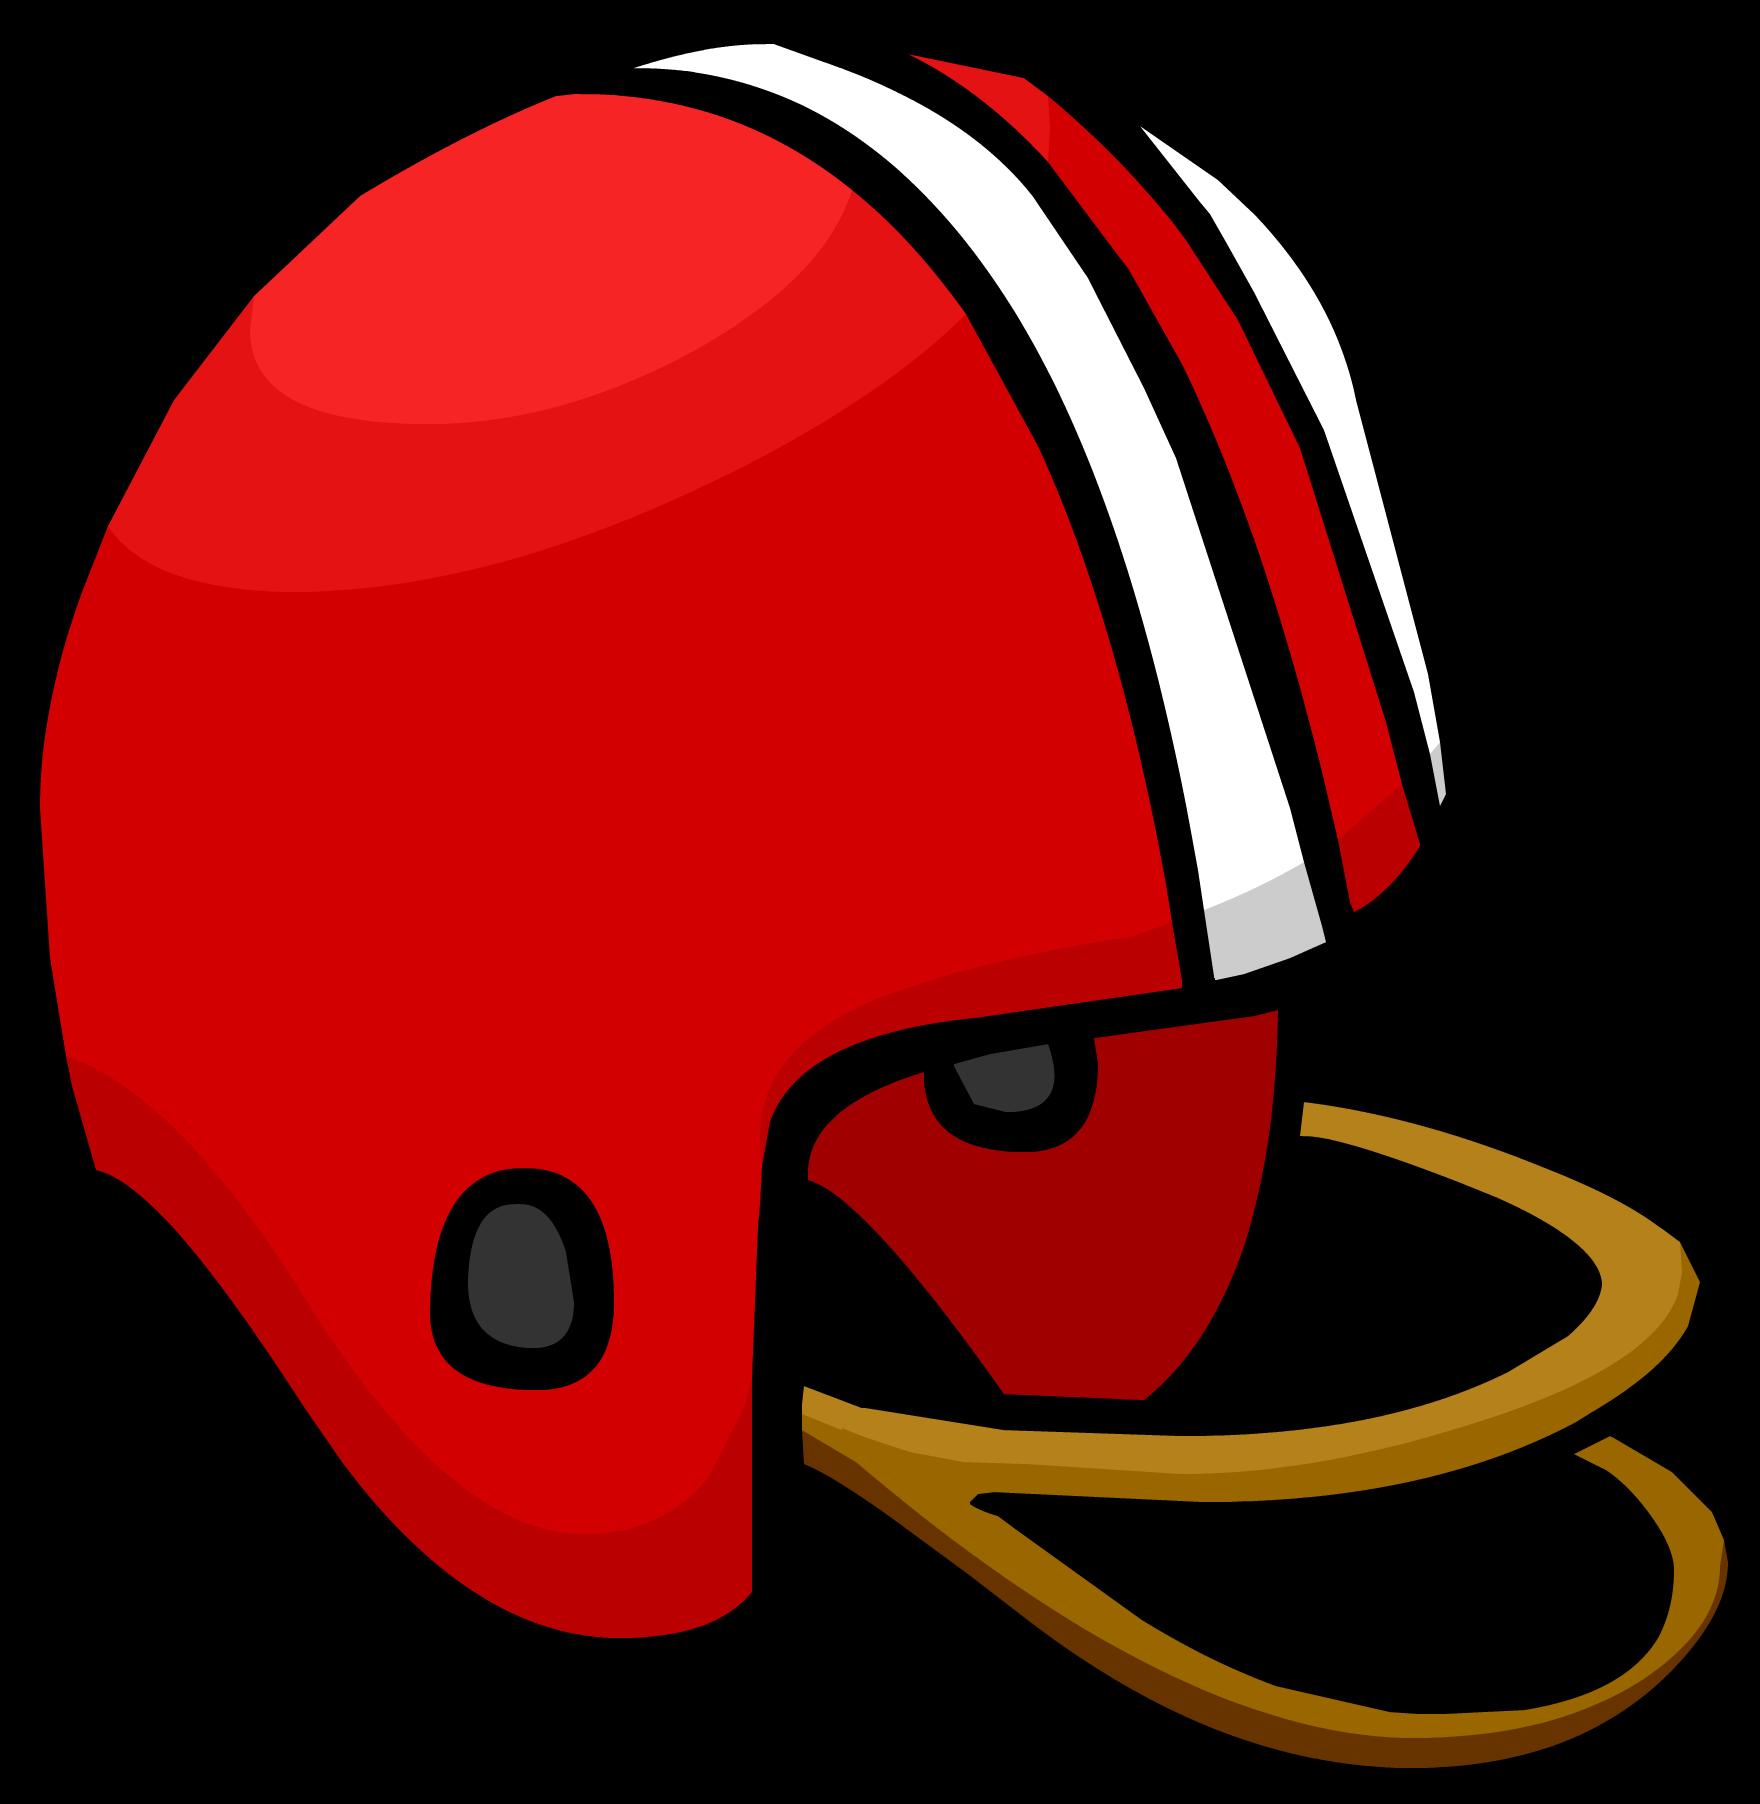 1760x1804 Free Football Helmet Clipart